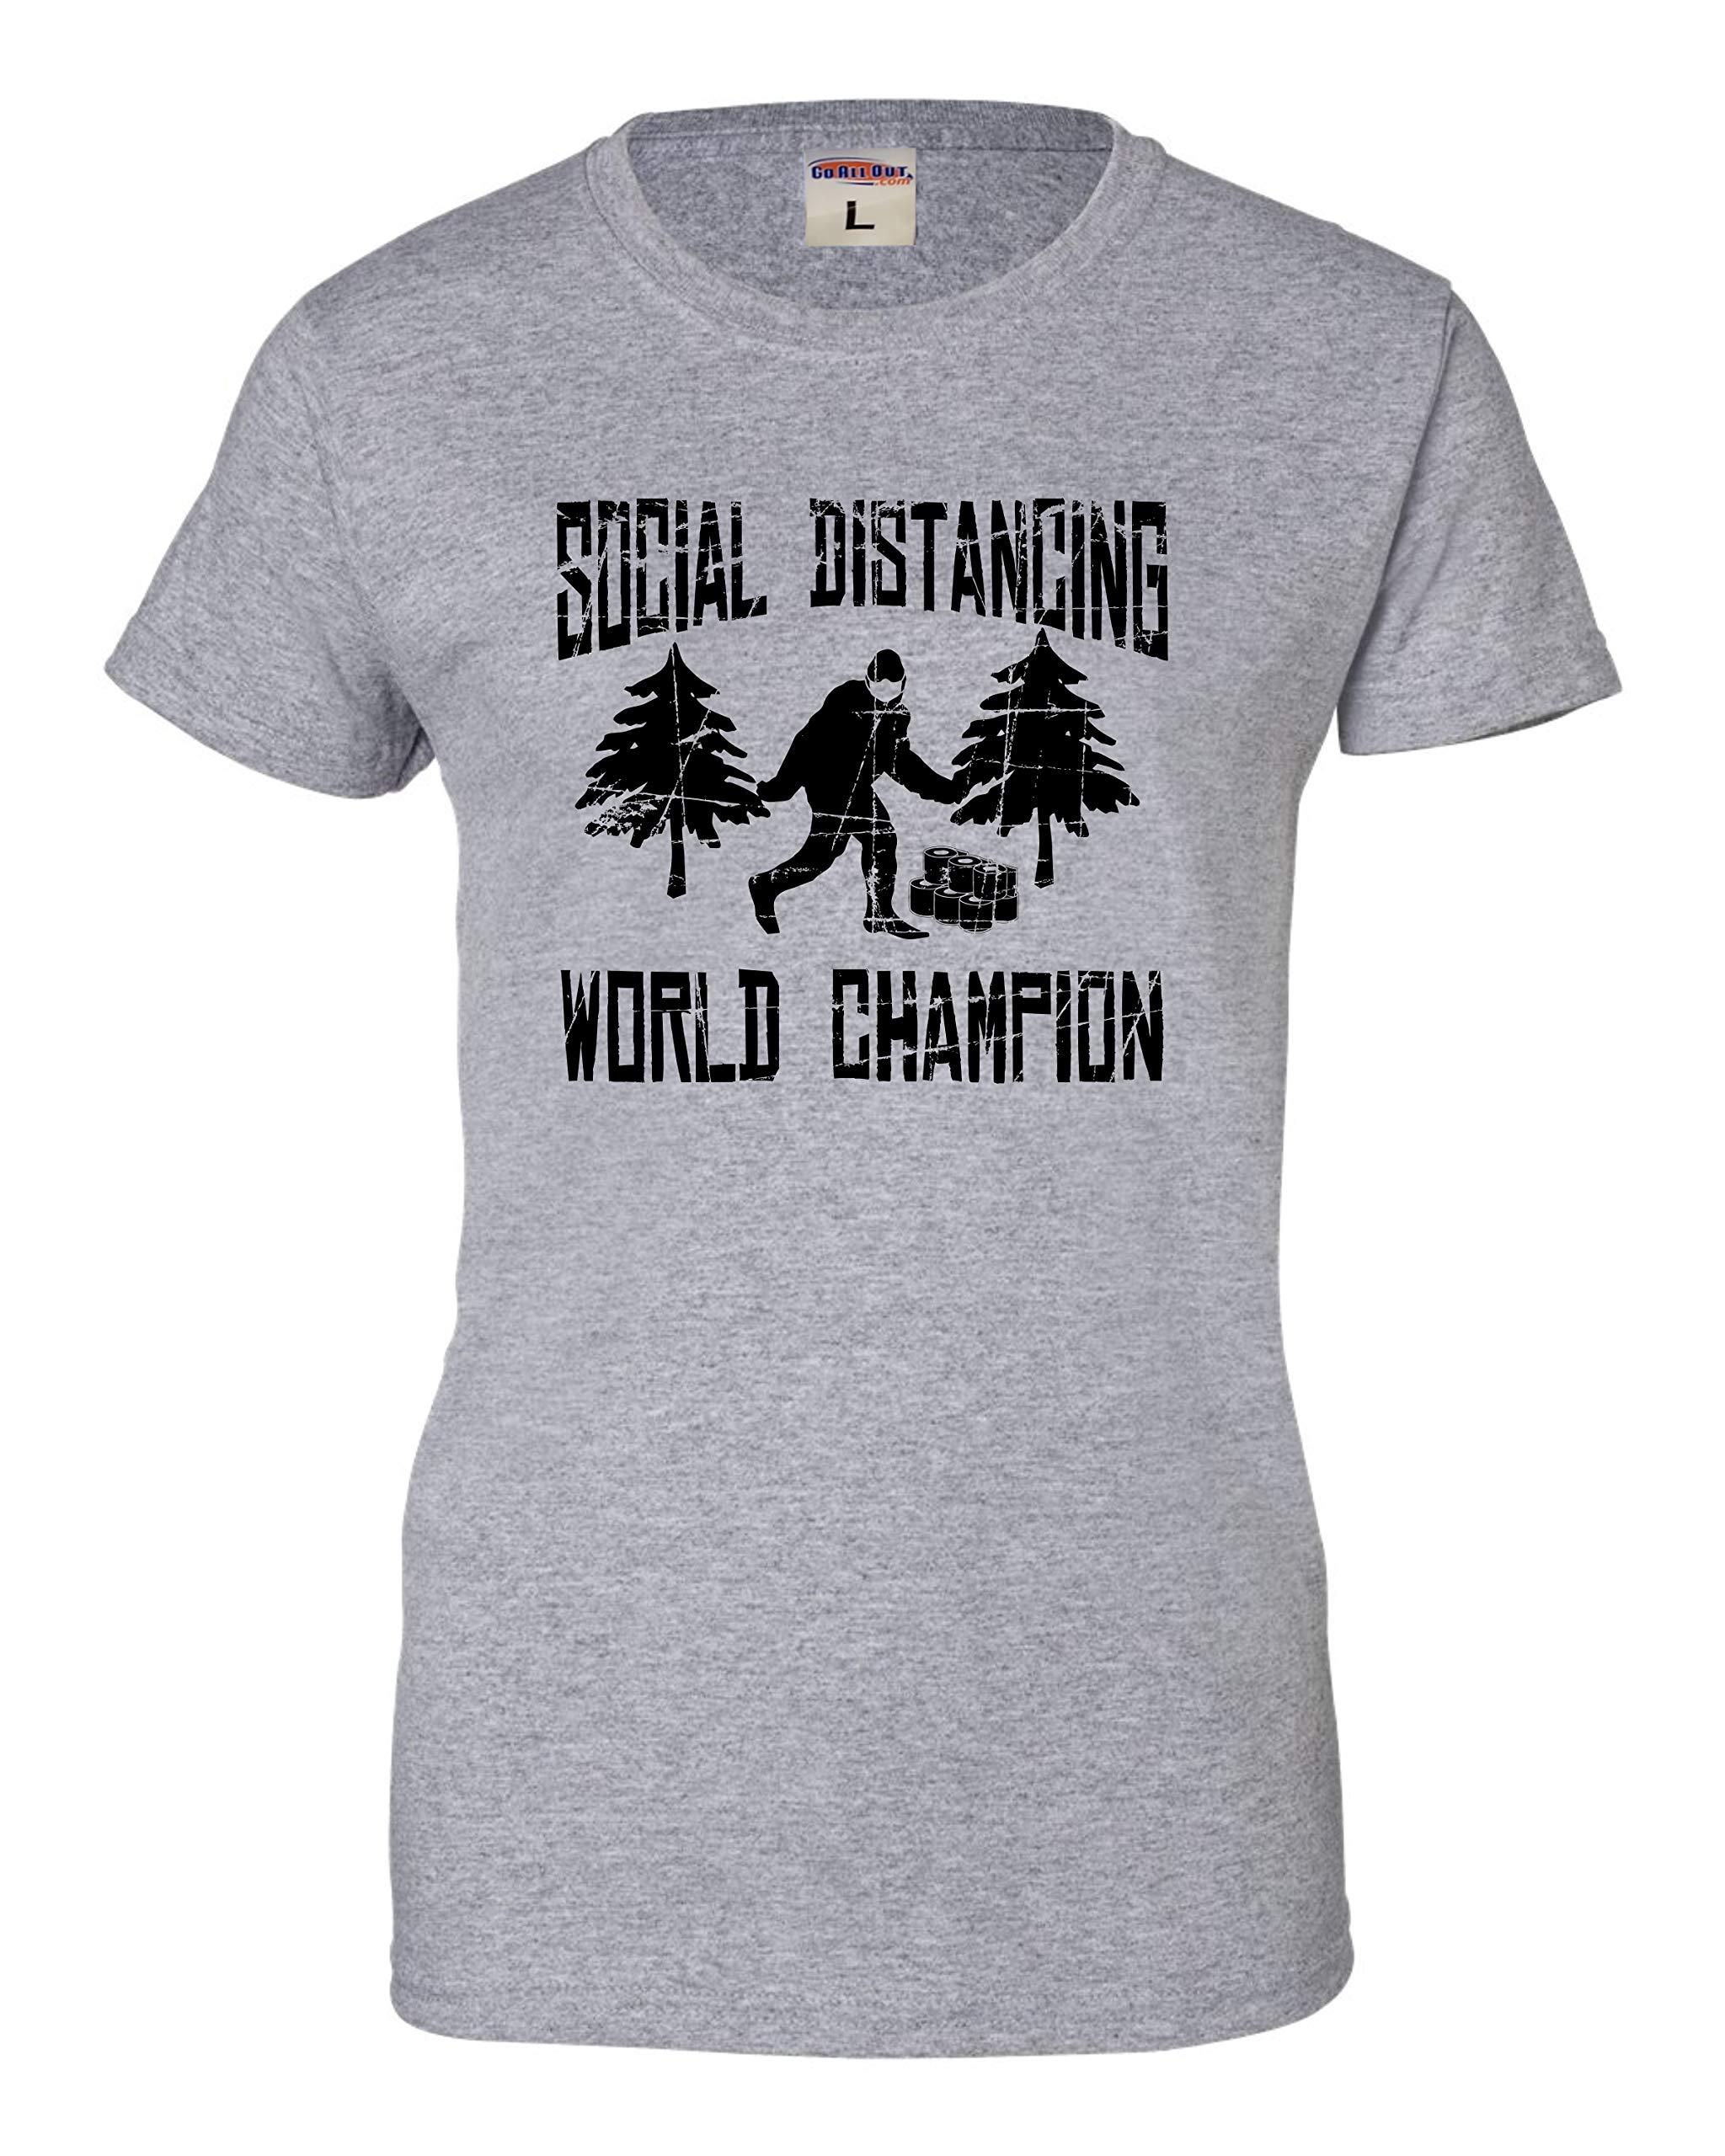 Go All Out Womens Sasquatch Social Distancing World Champion Bigfoot T-Shirt